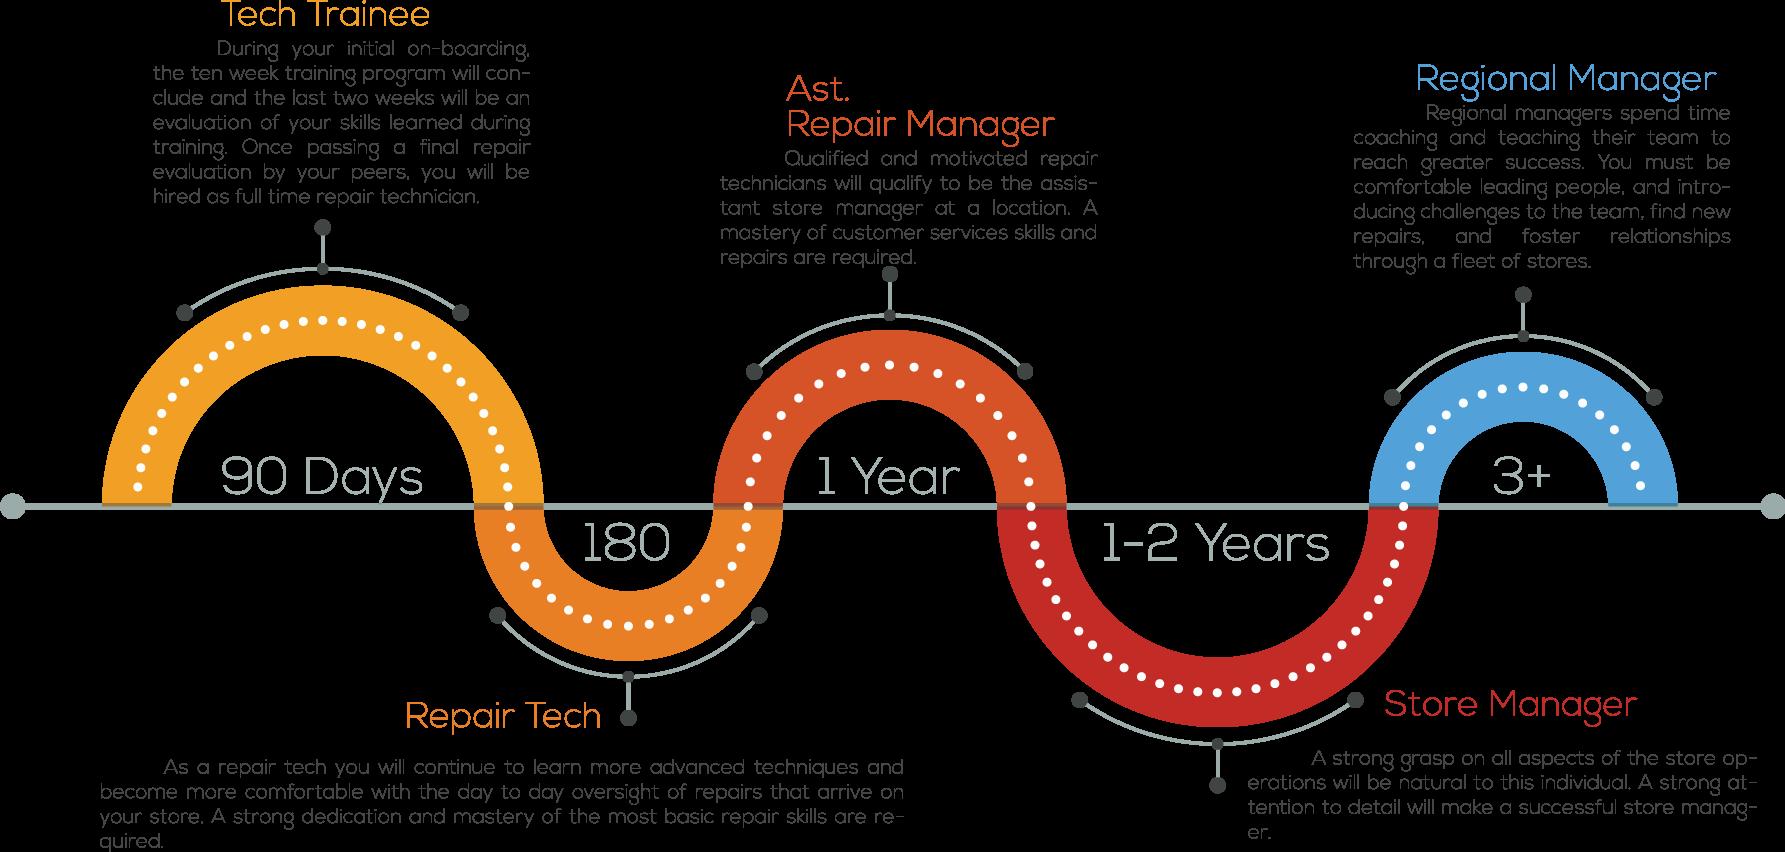 image transparent stock career path timeline